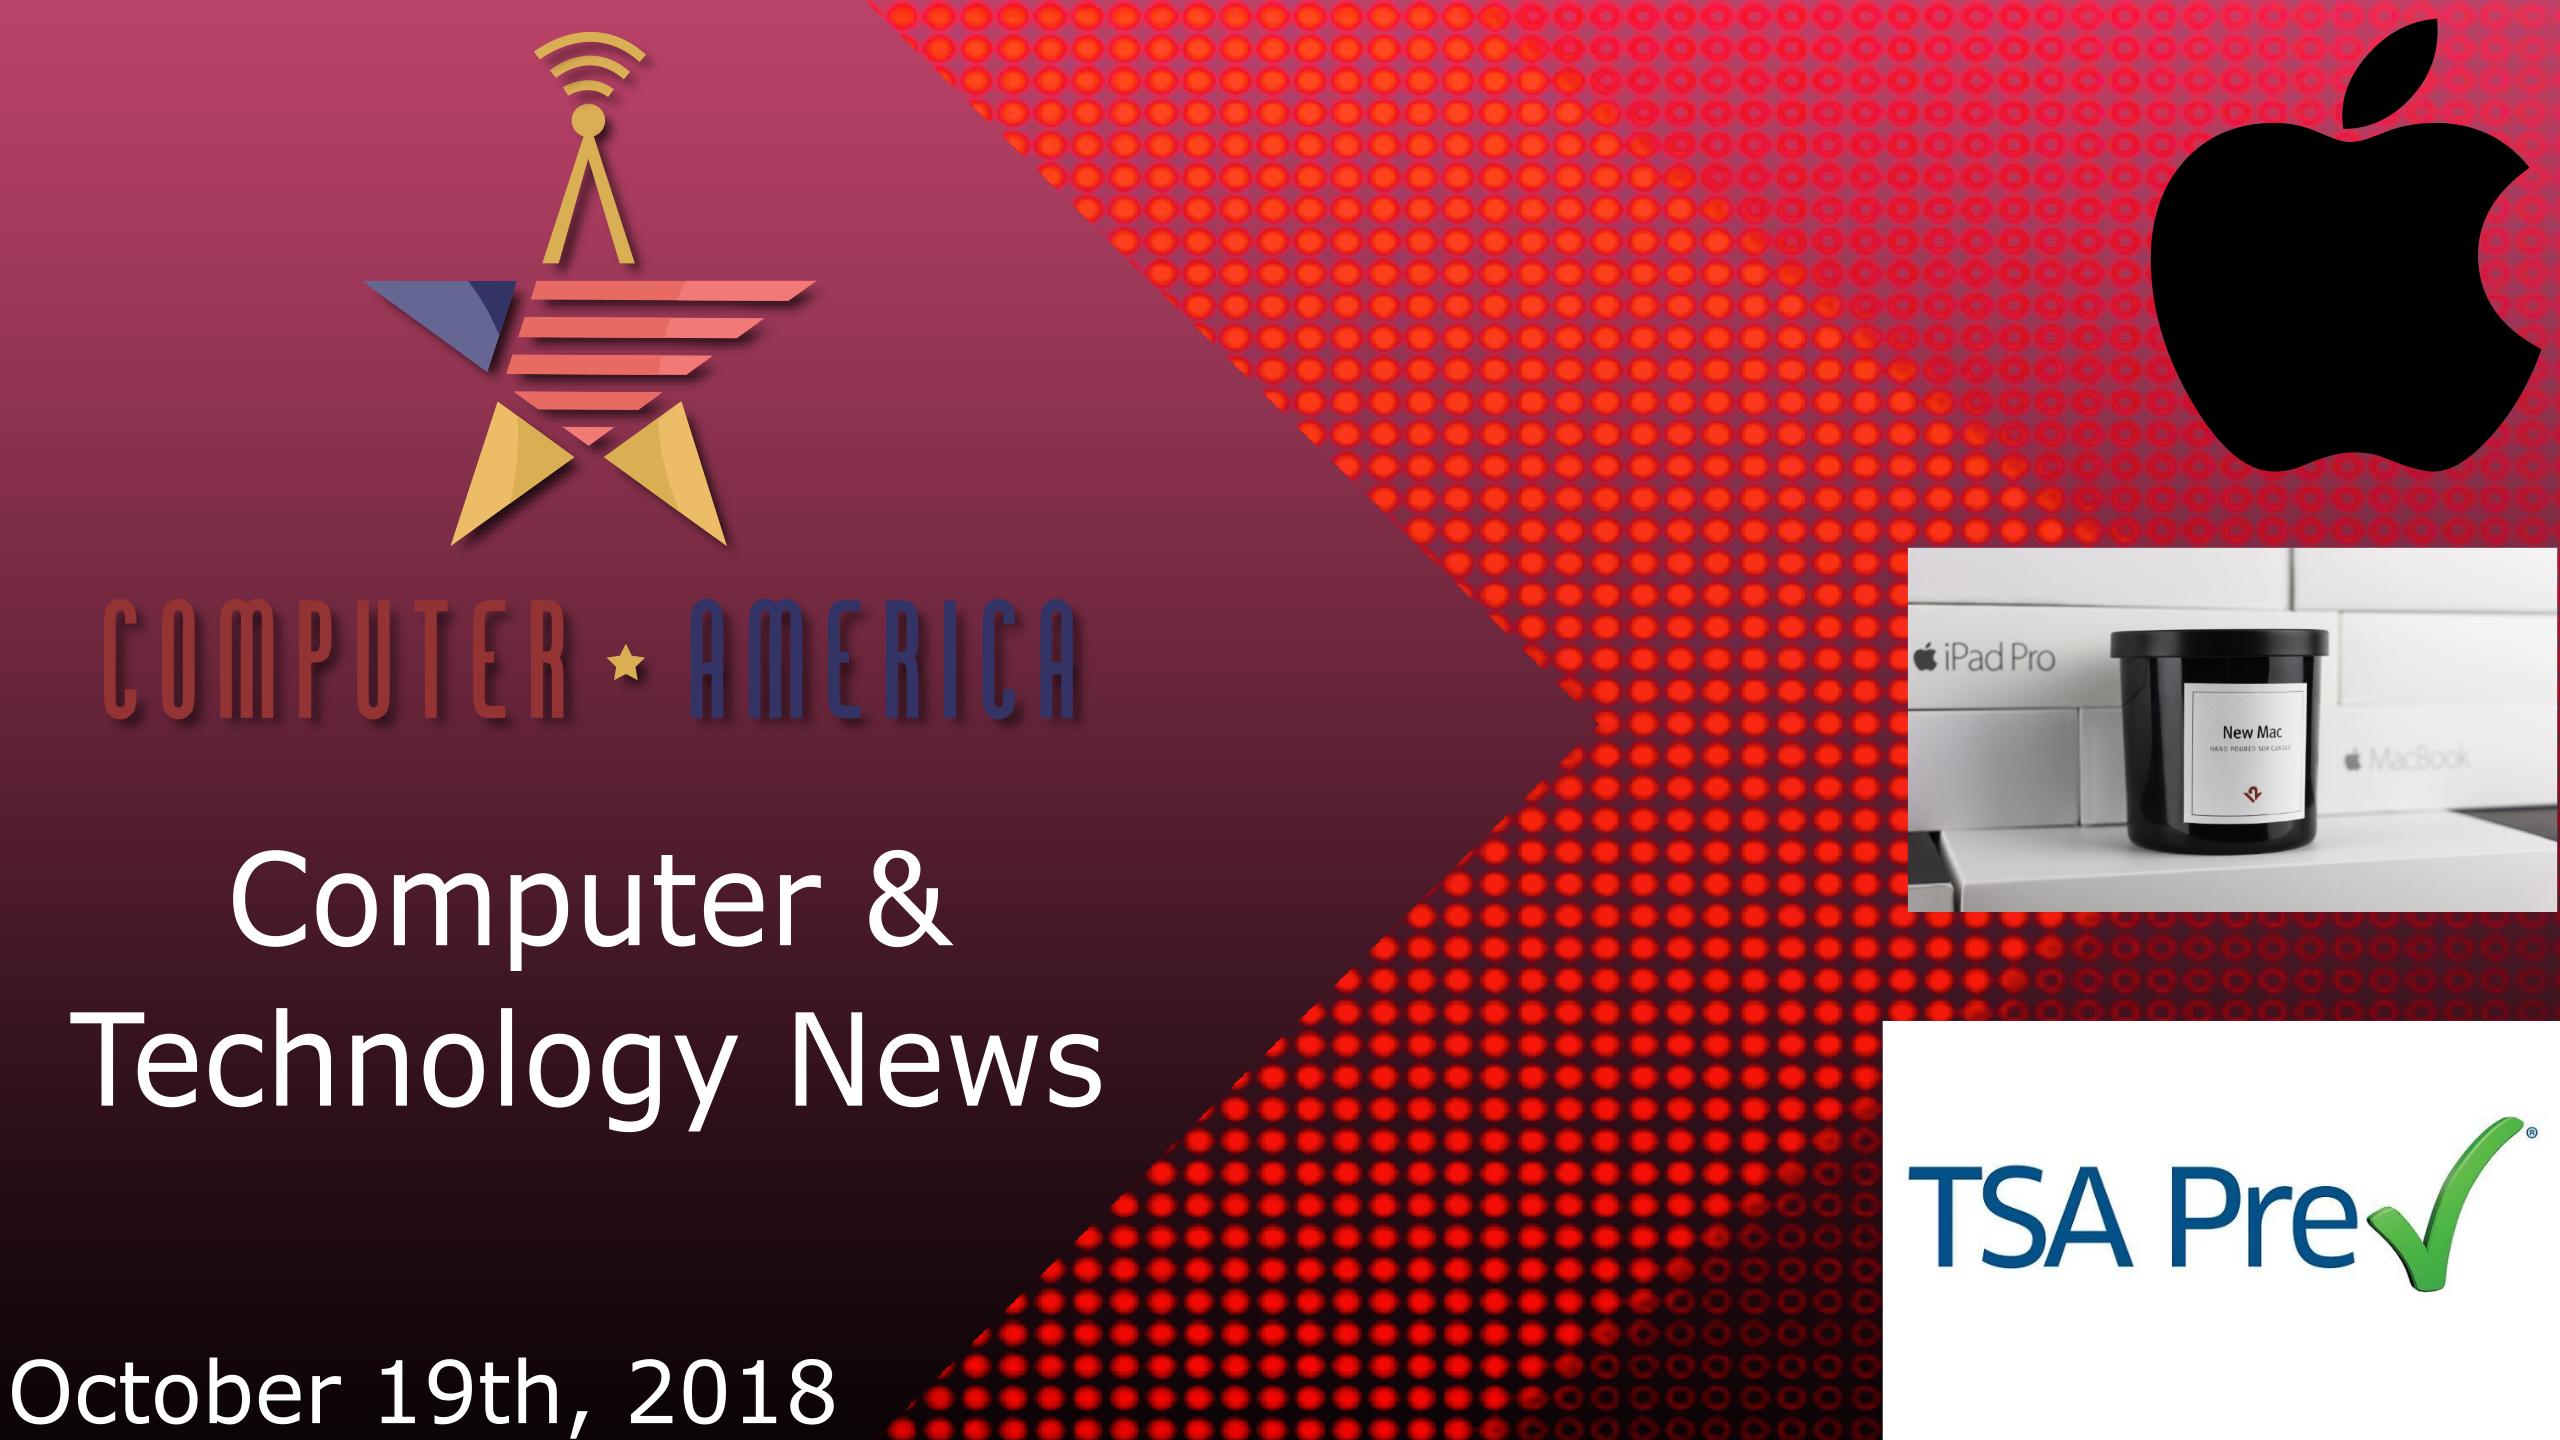 Computer/Technology News, Talking Apple News, TSA Biometric